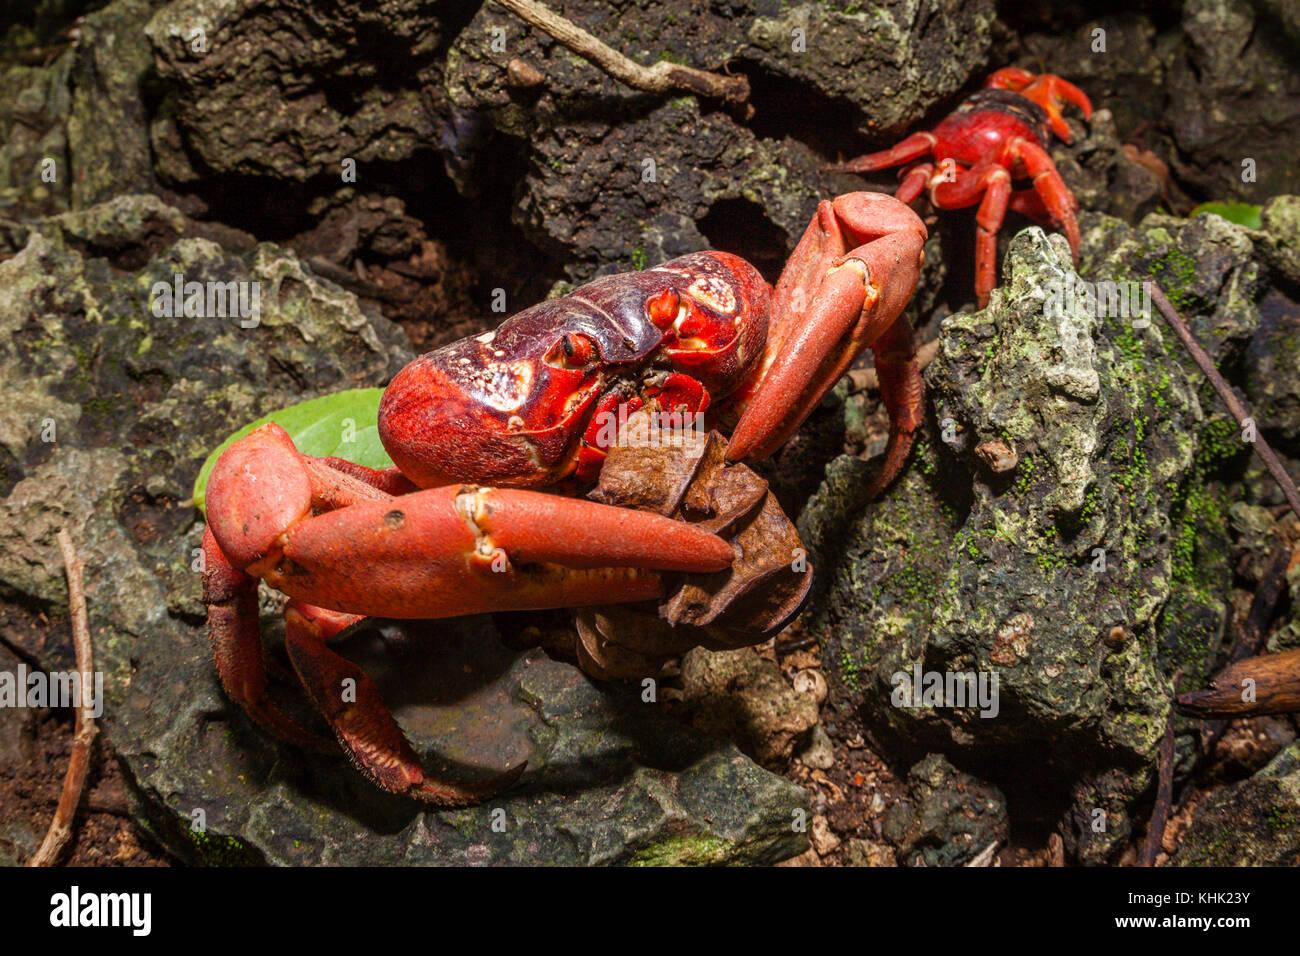 Christmas Island Red Crab feeding on Leaf, Gecarcoidea natalis, Christmas Island, Australia - Stock Image